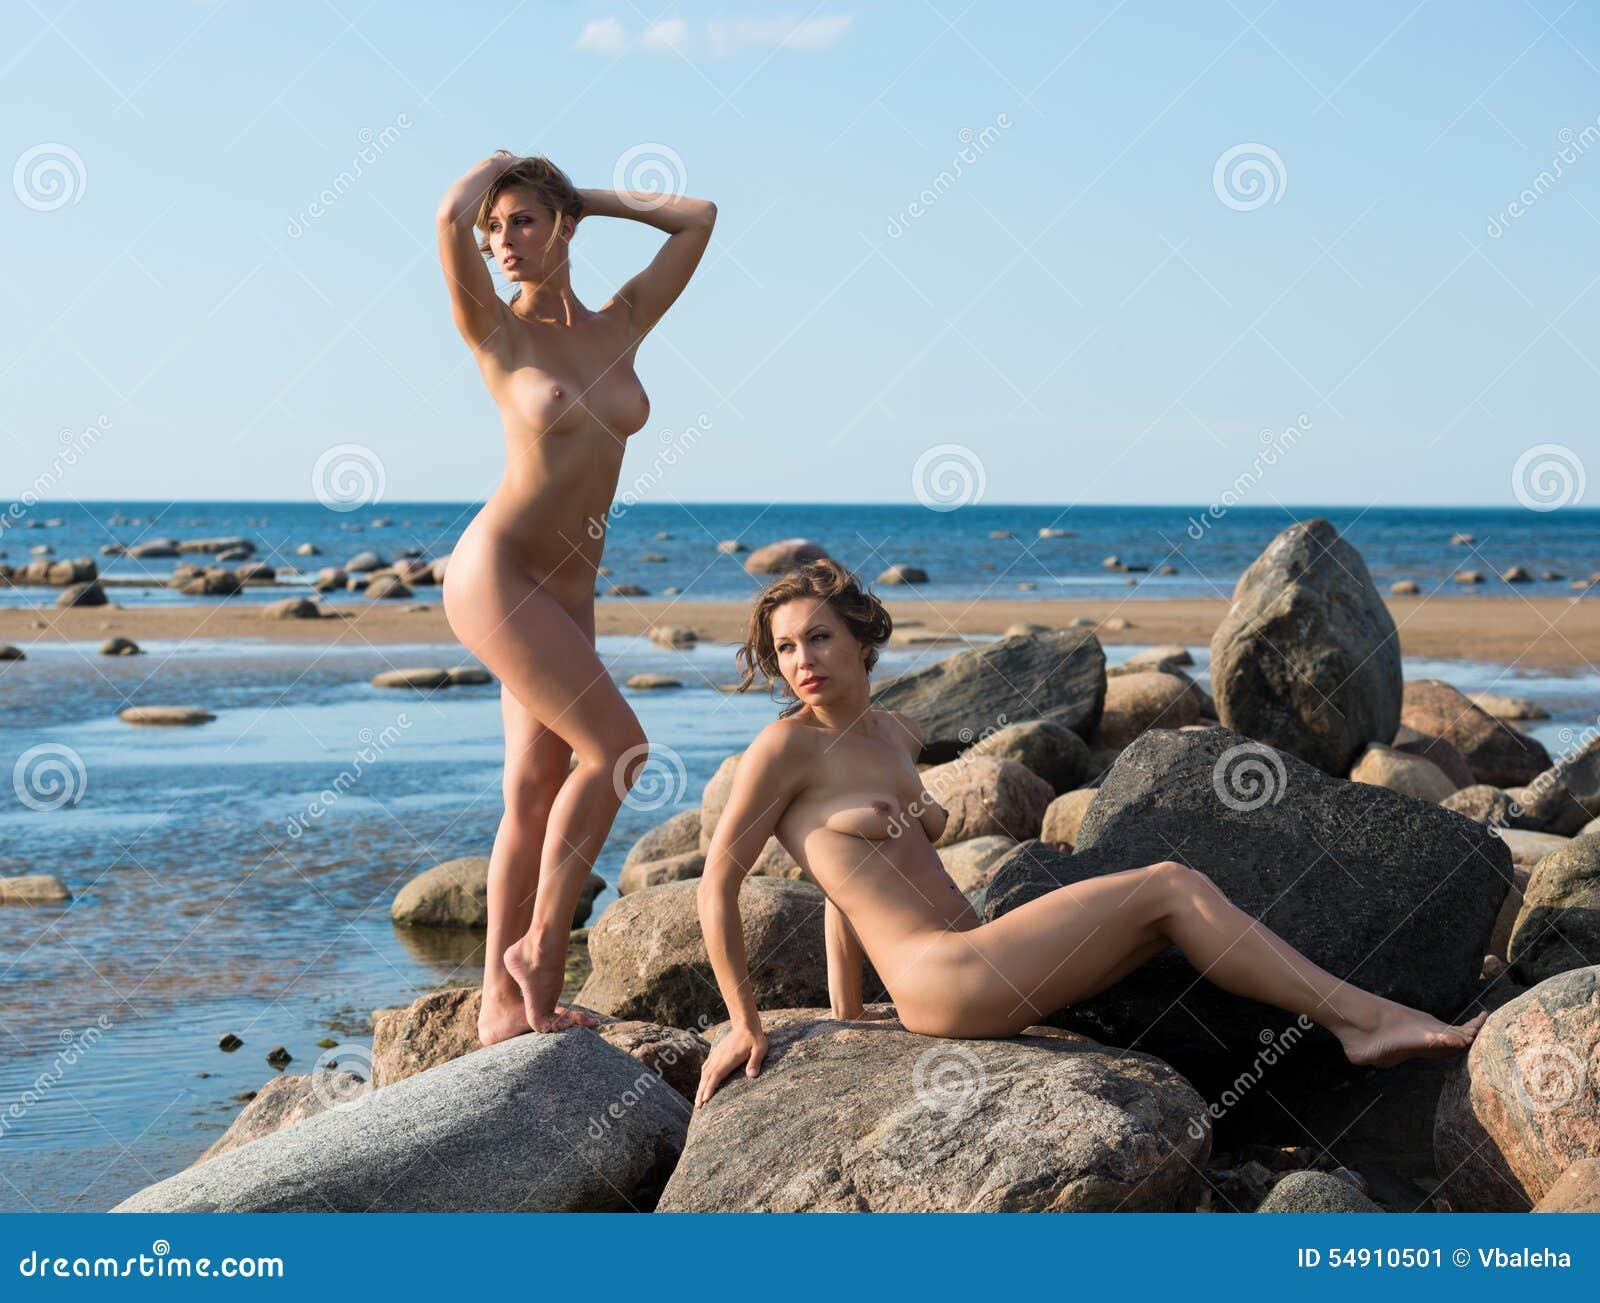 pinky tuscadero naked